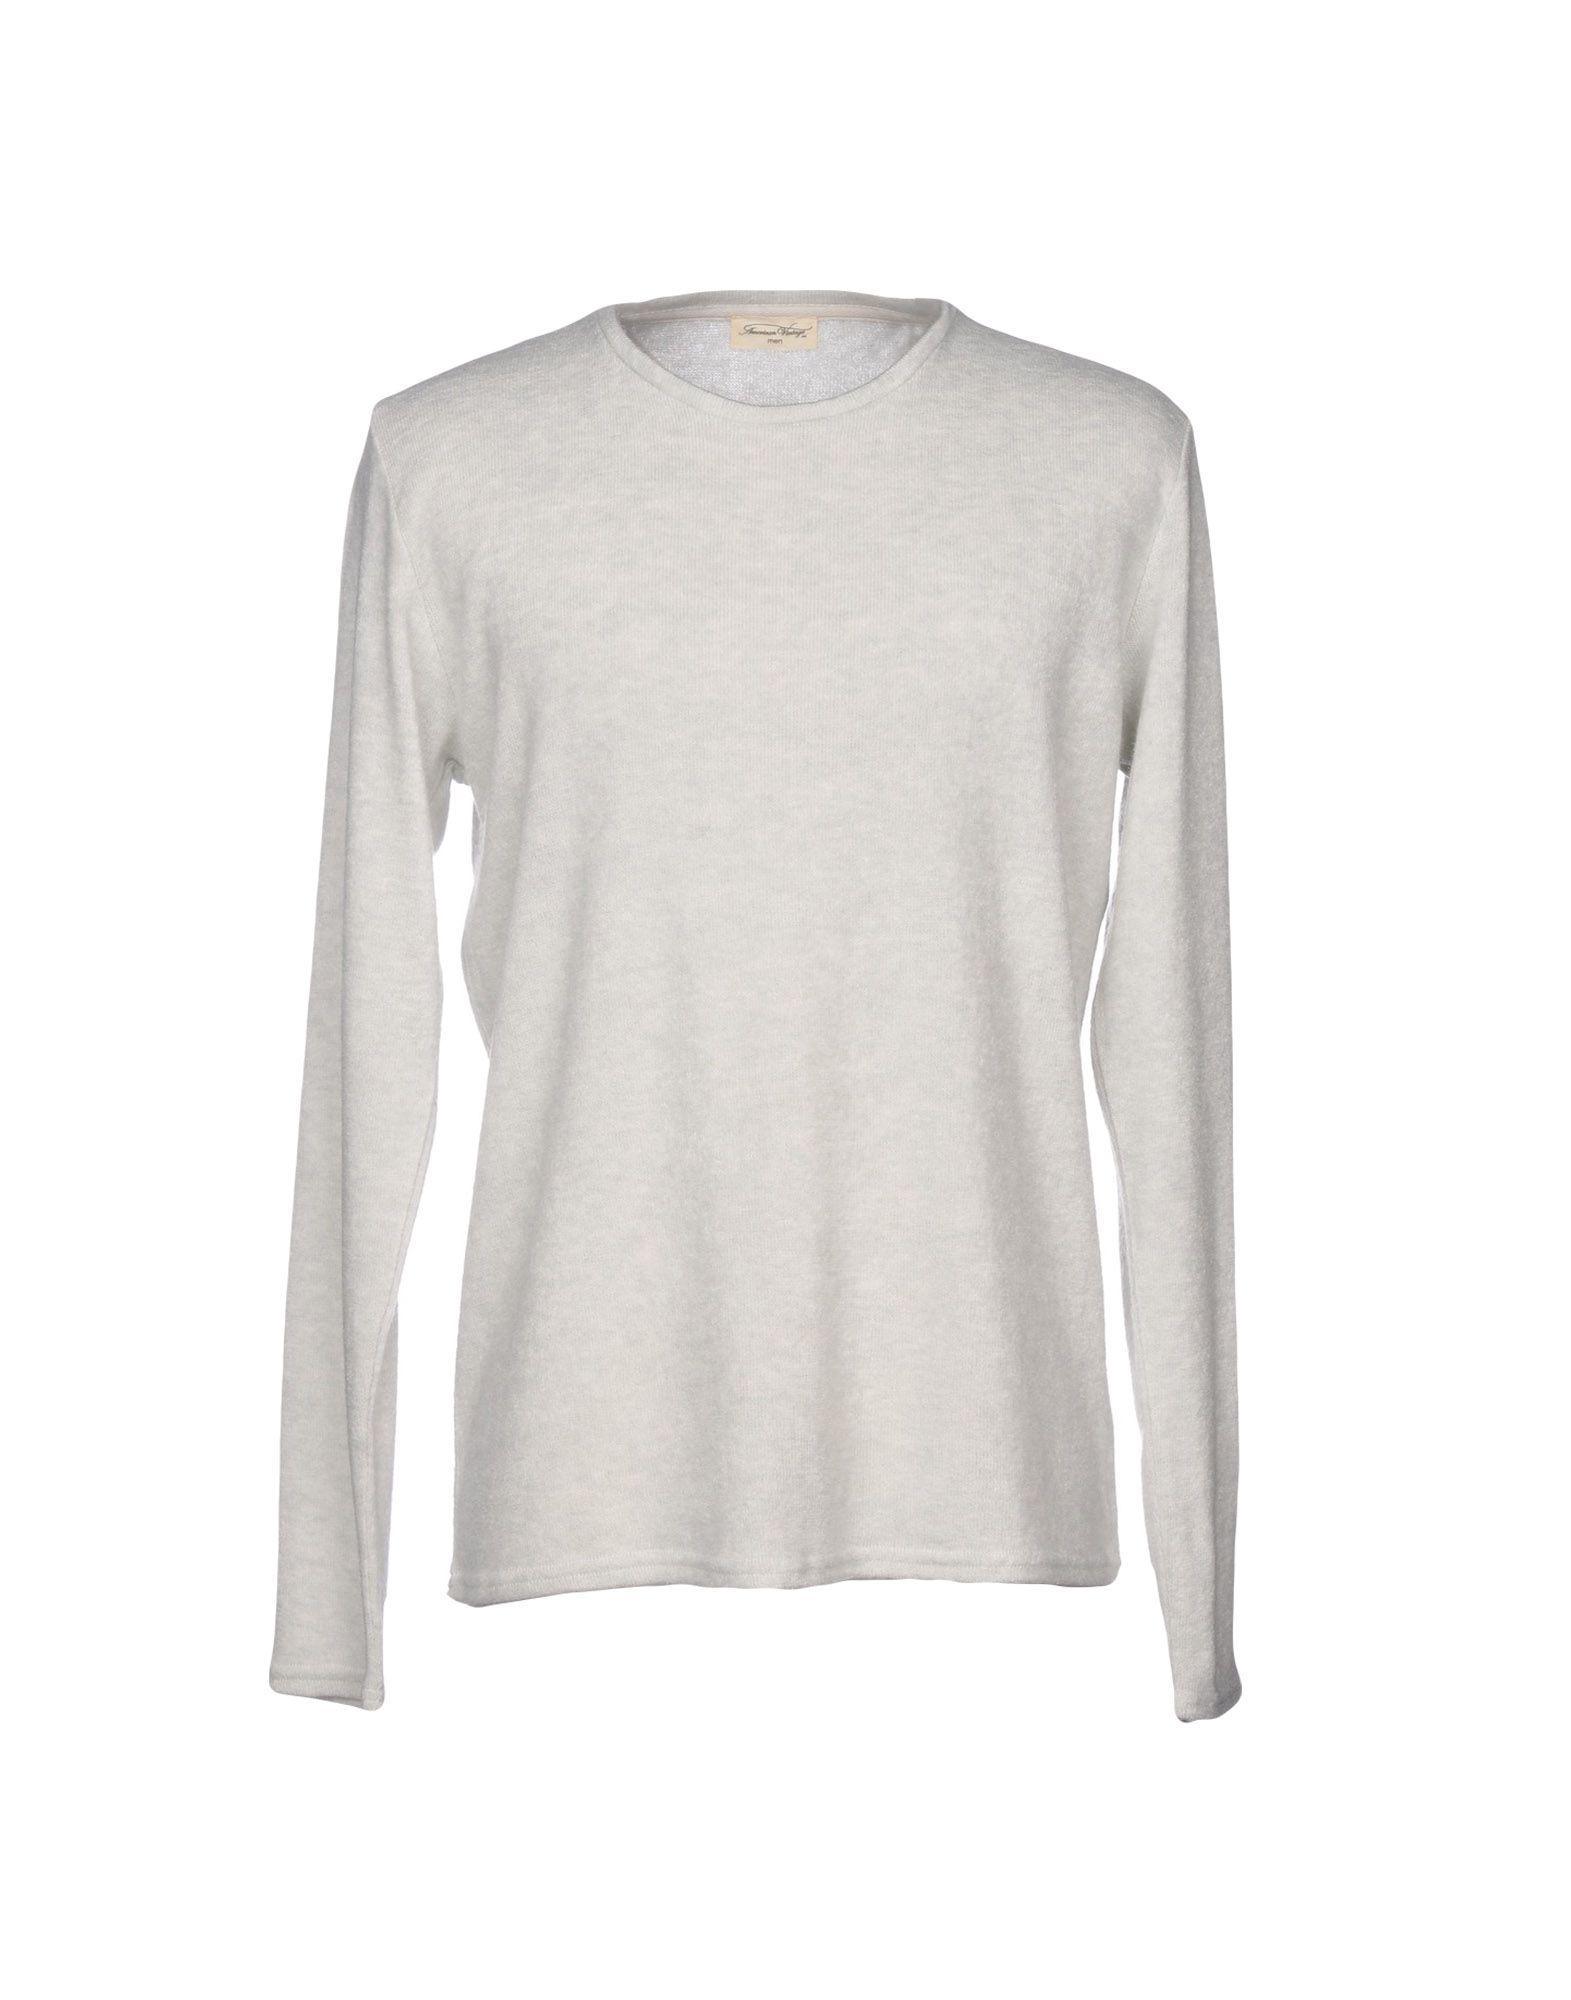 4cbf8d34adf8 Lyst - American Vintage Sweater for Men